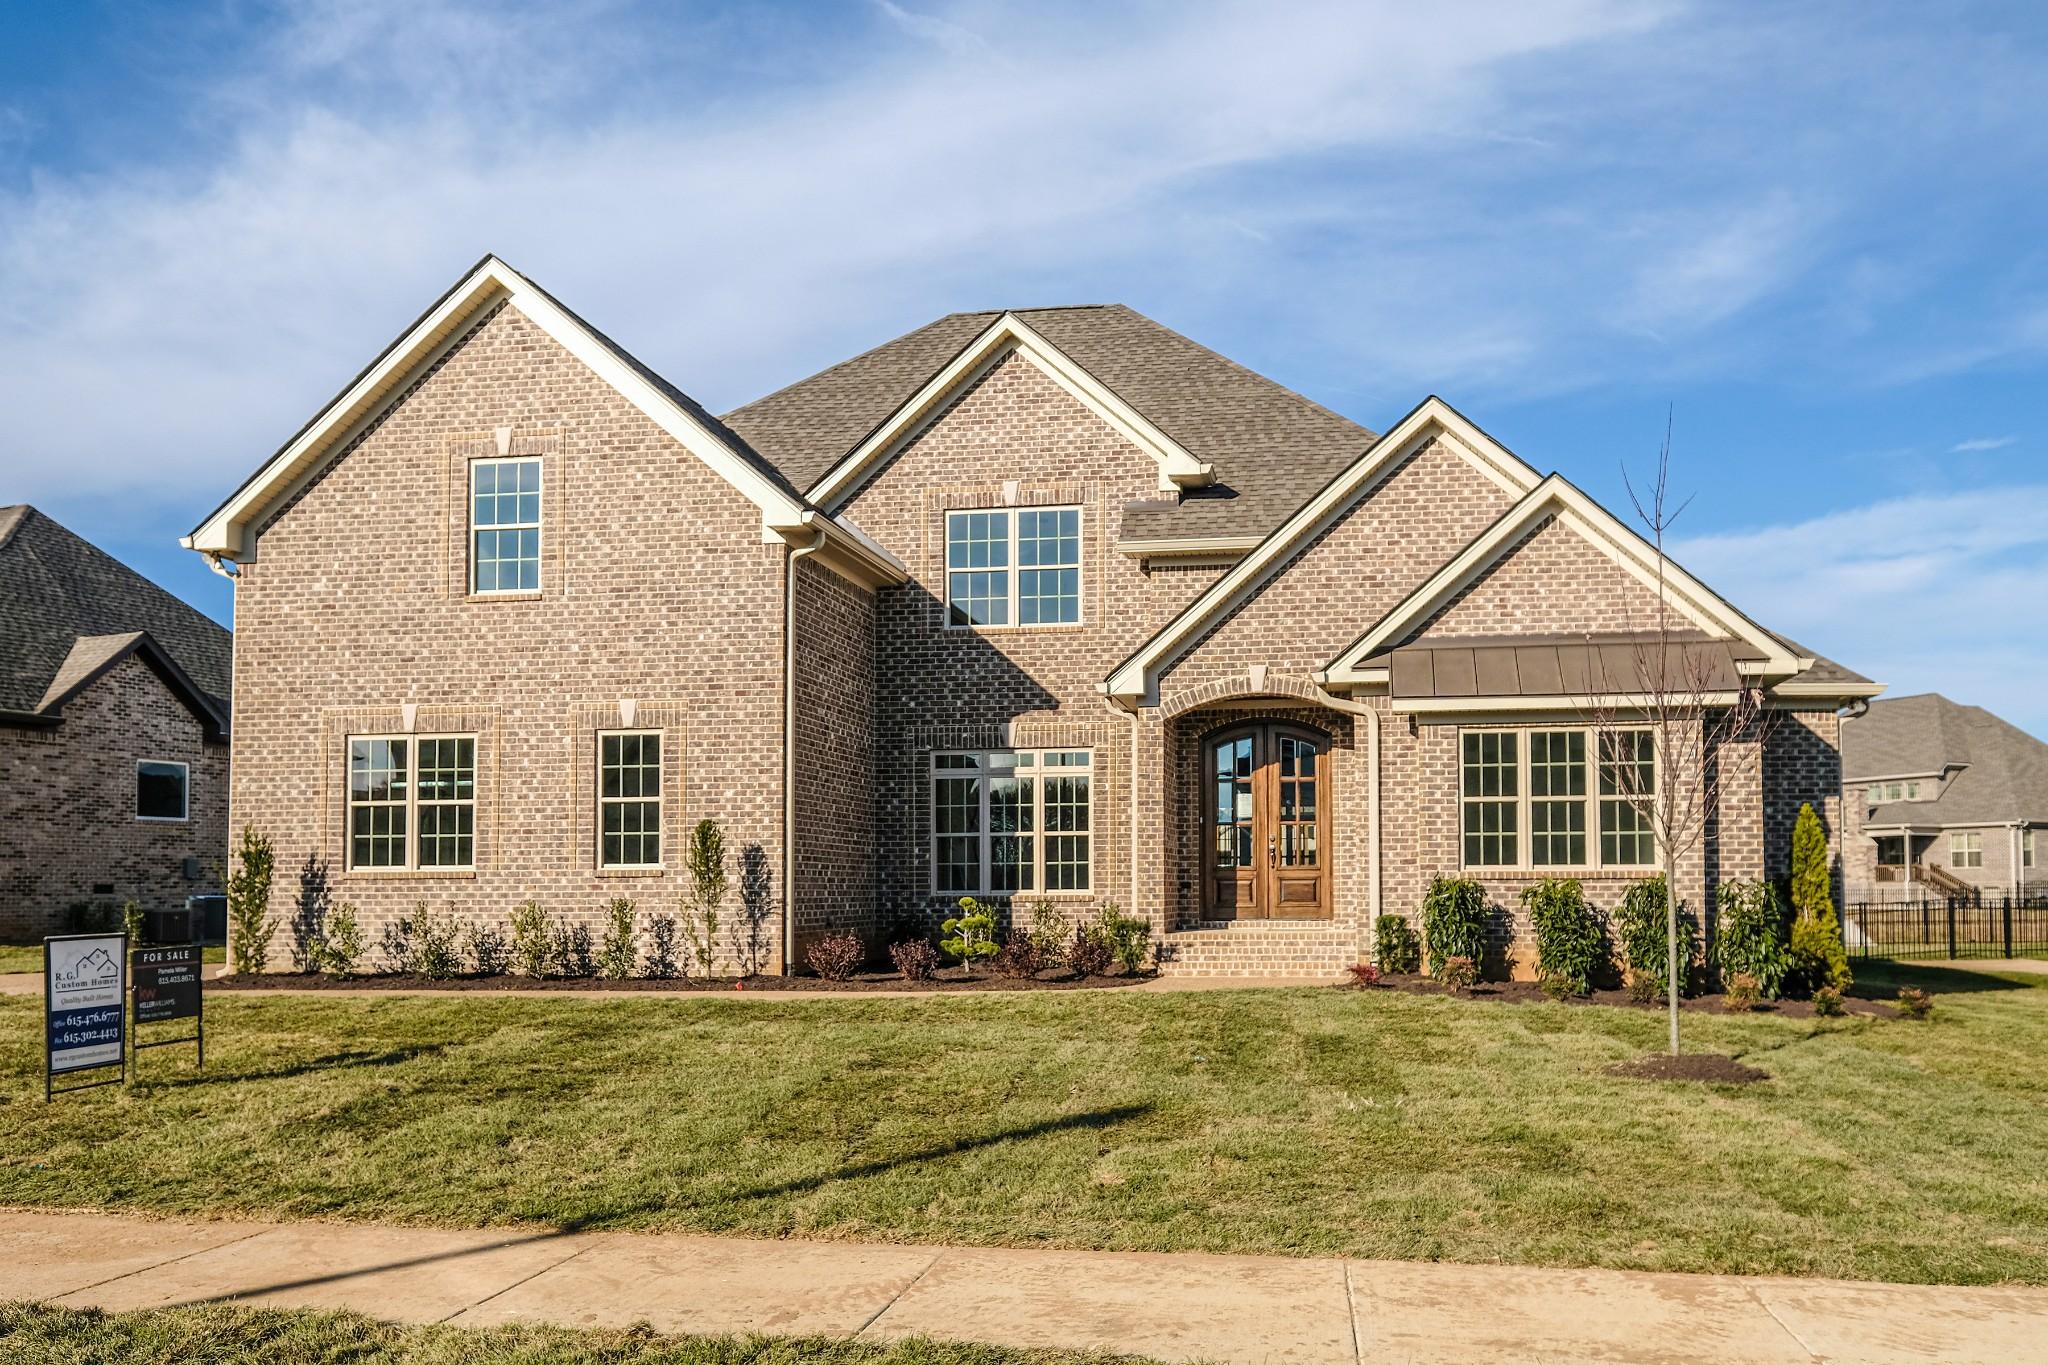 2036 Autumn Ridge Way (Lot 277), Spring Hill, Tennessee